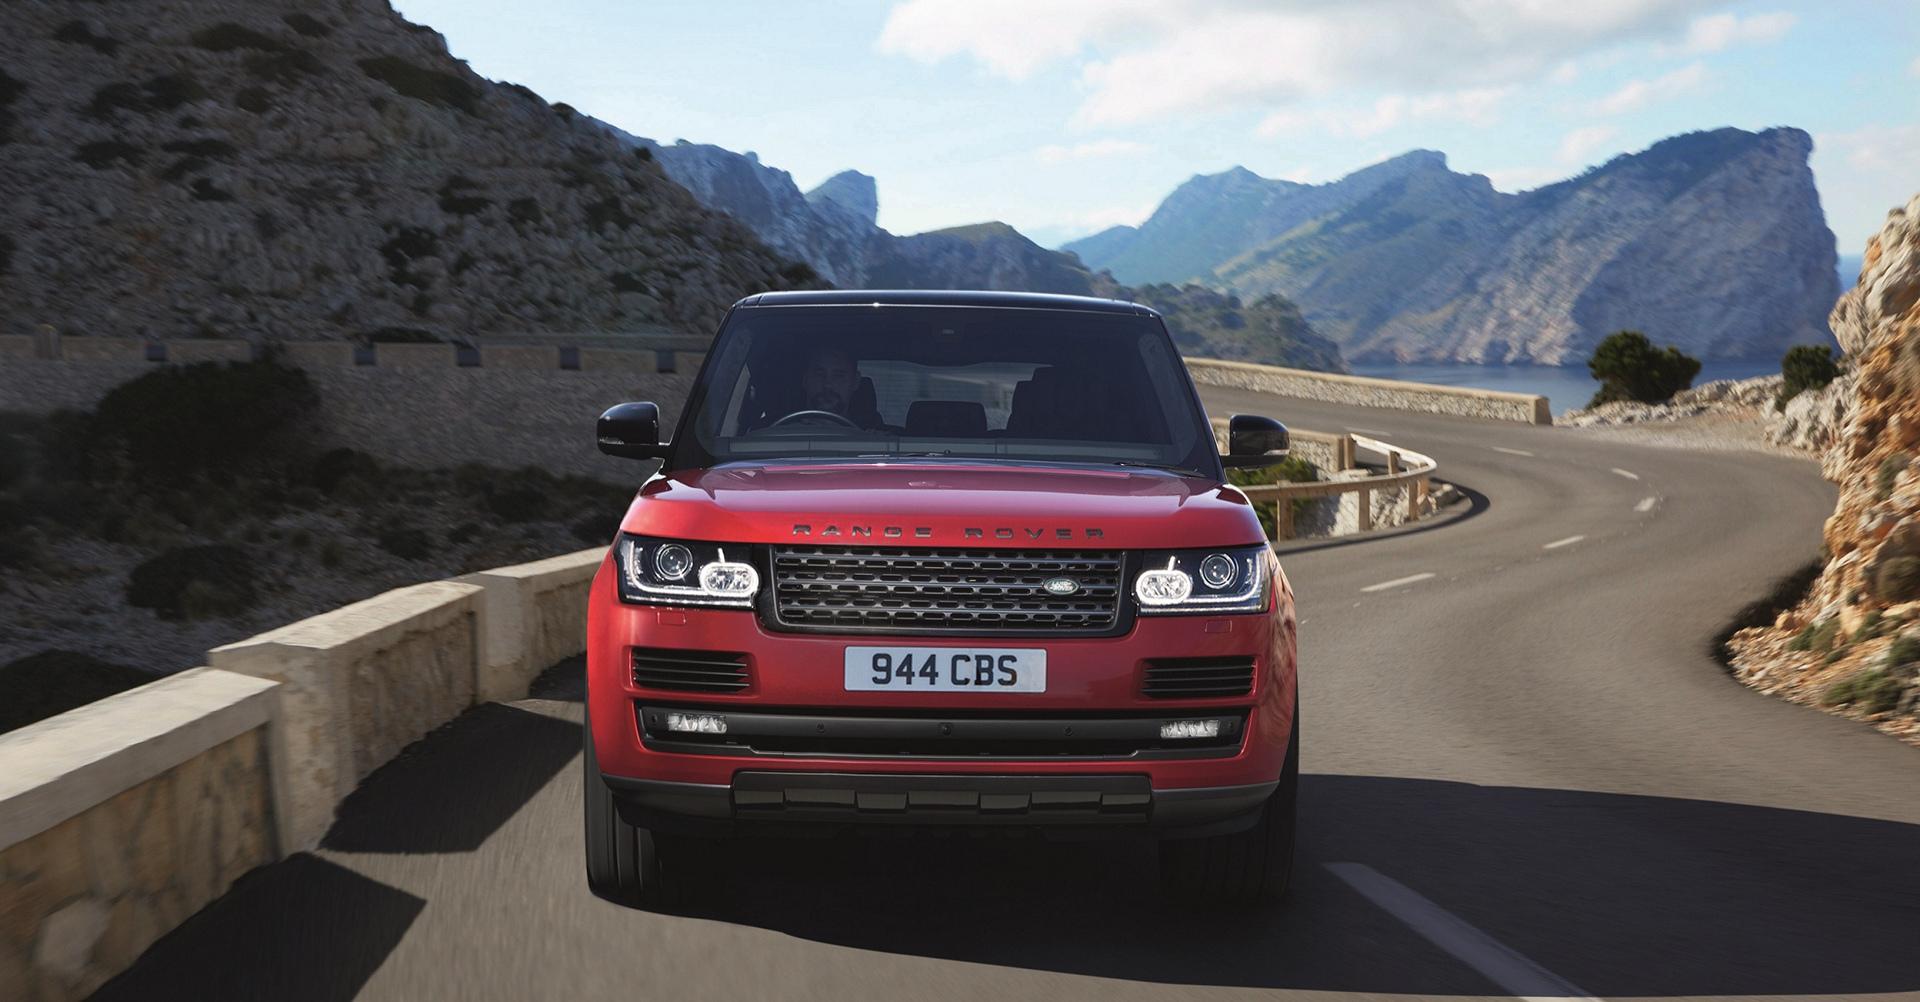 2017 Range Rover ©2017 Range Rover © Tata Group Tata Group